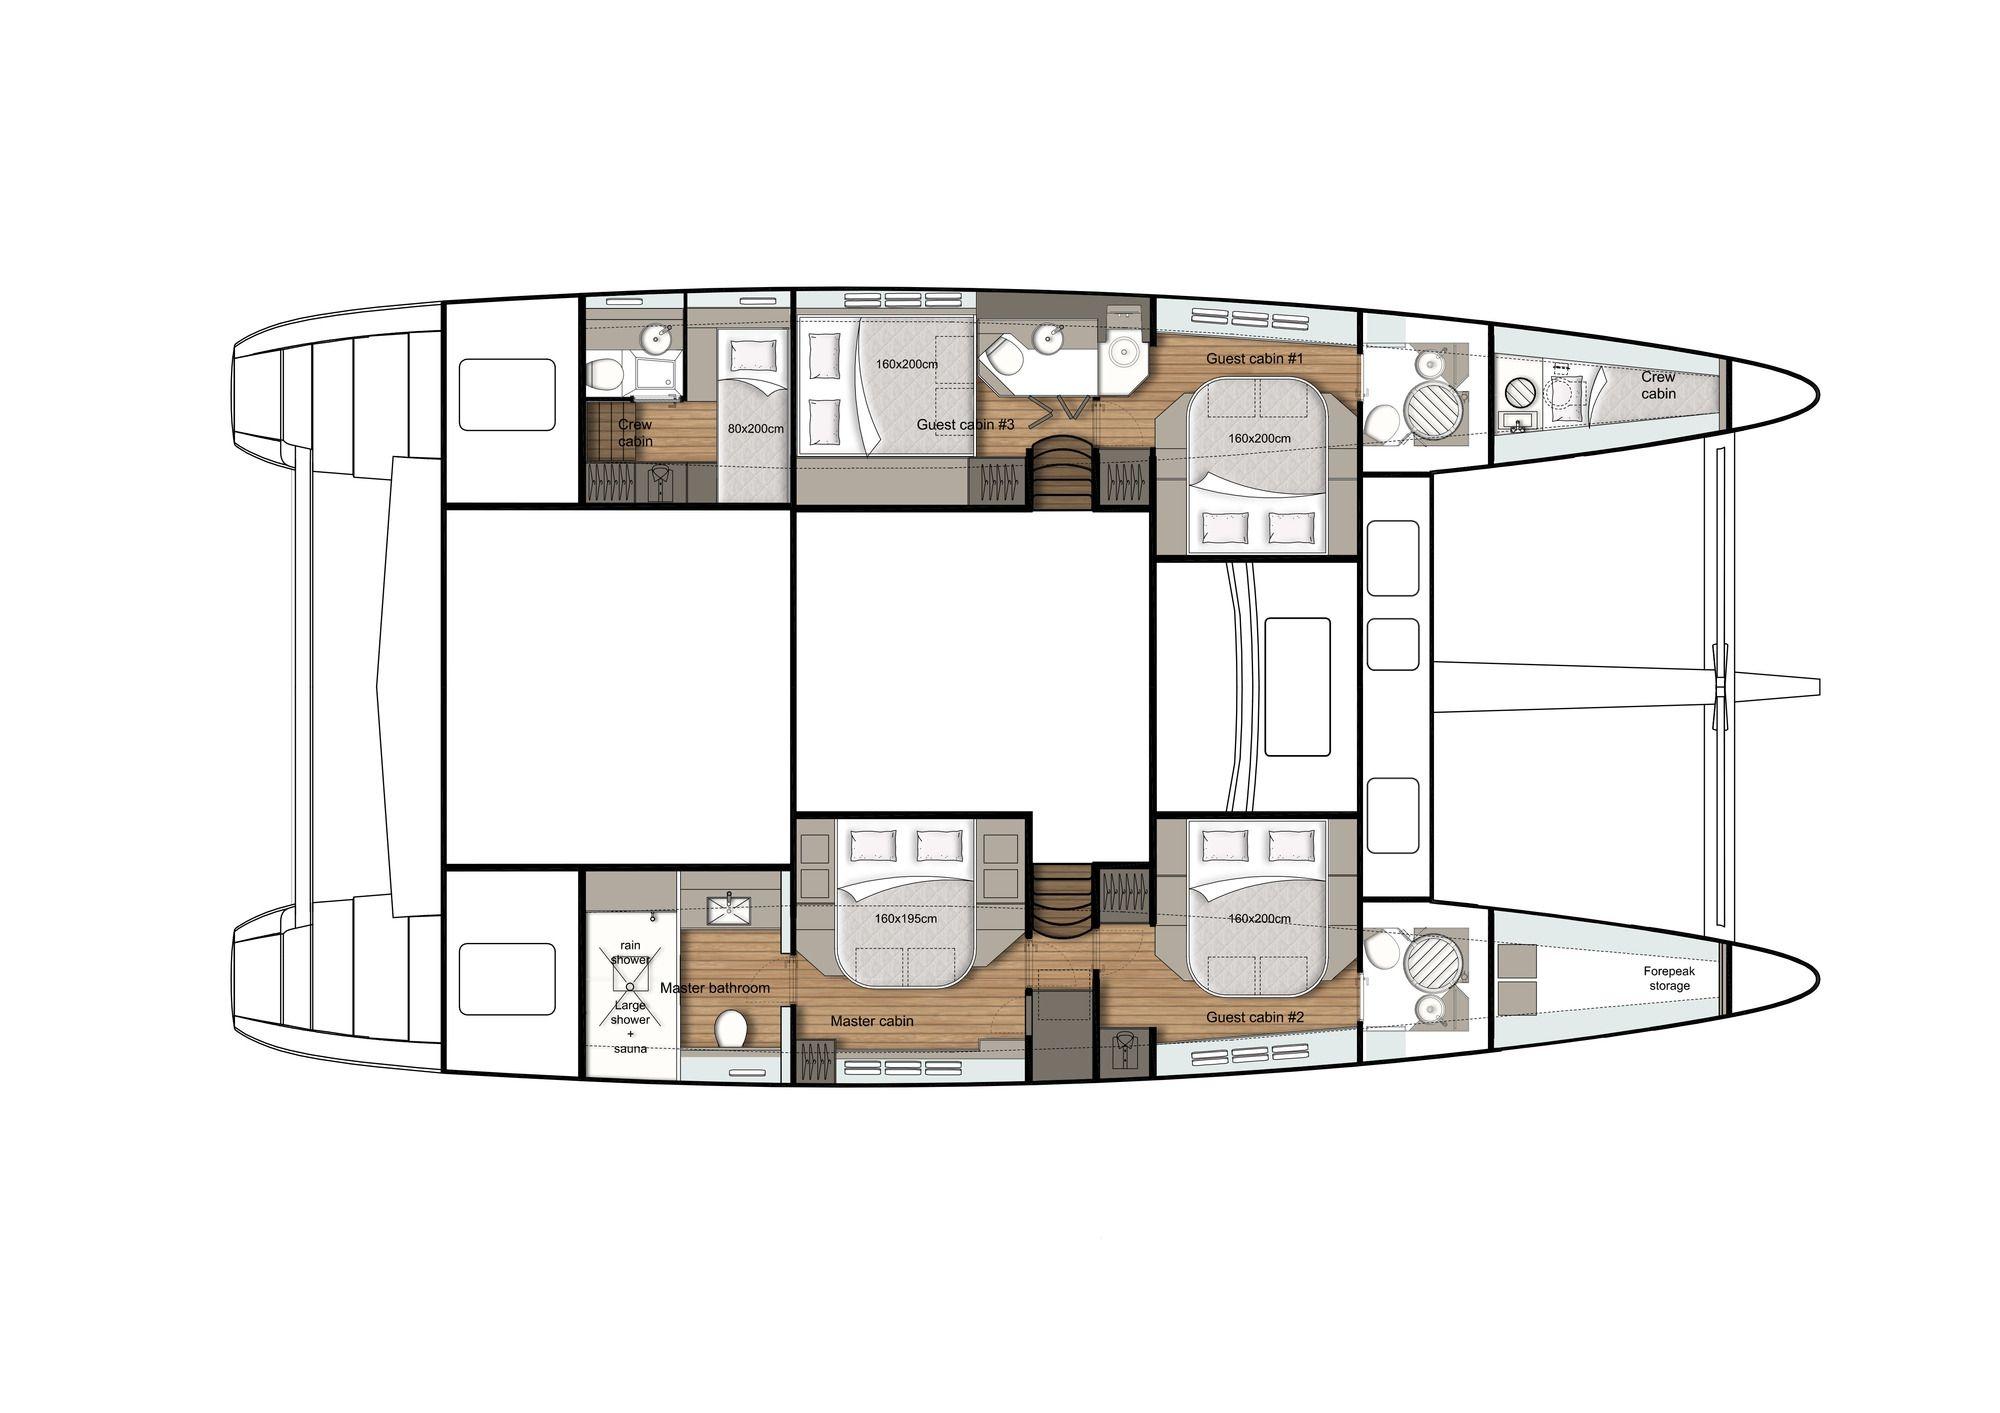 ADEA Sunreef 60 Luxury Catamaran  Lower Deck